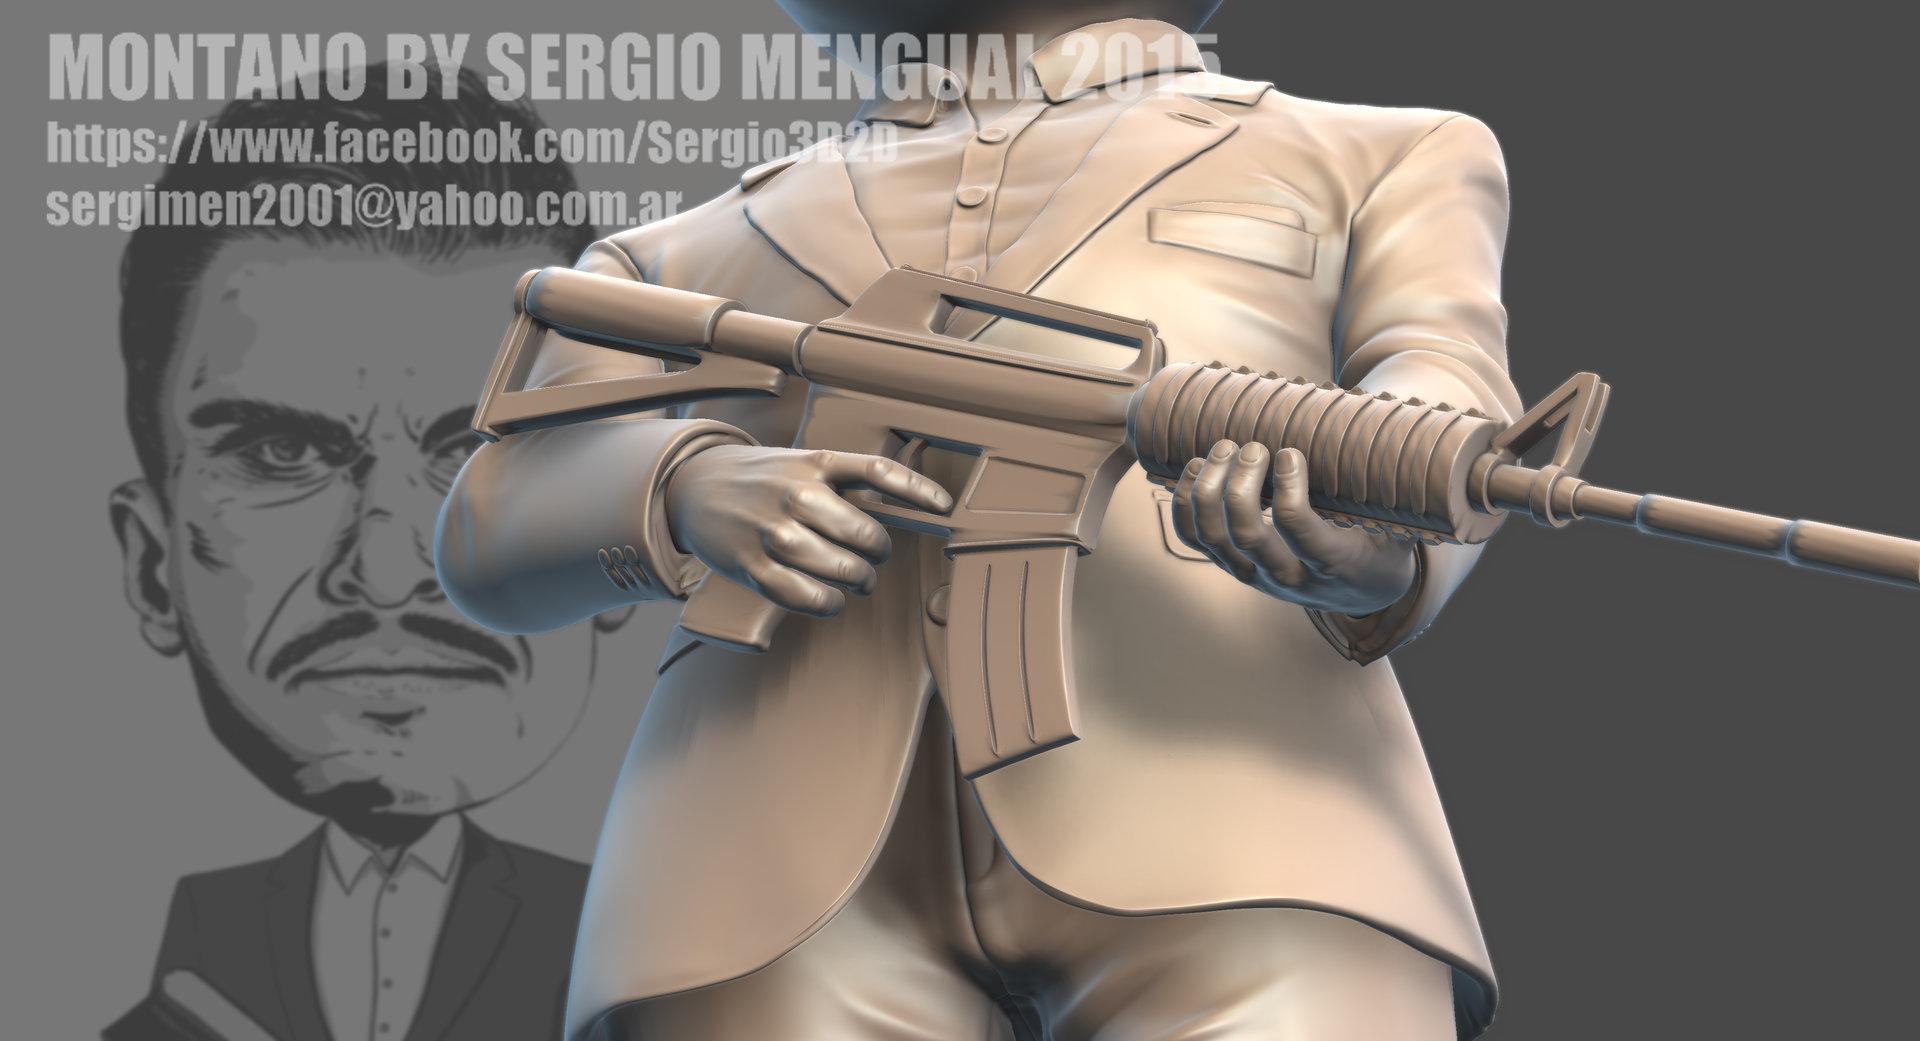 Sergio gabriel mengual montano final8